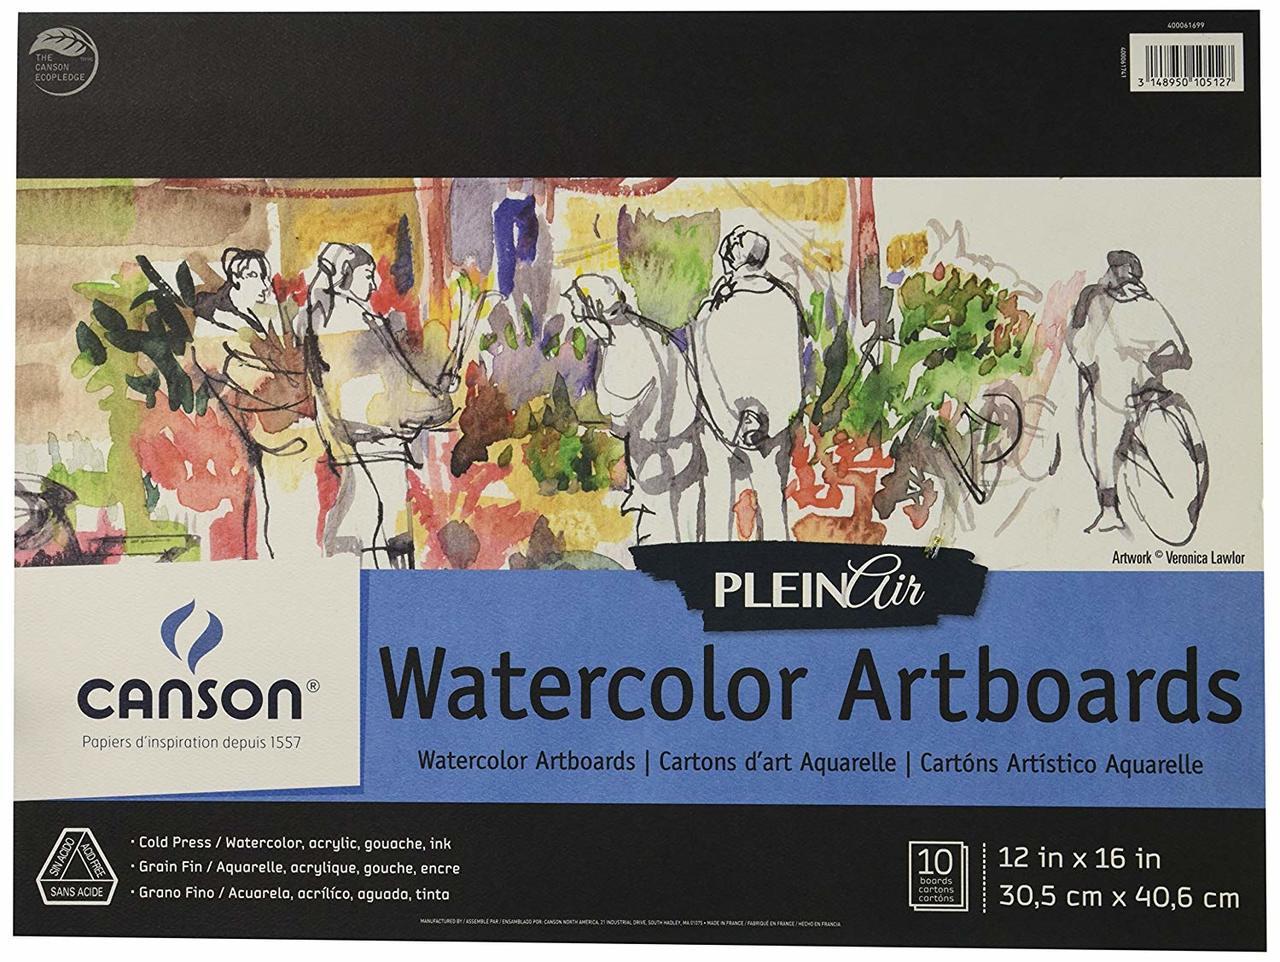 Canson Plein Air Watercolor Artboard 12x16 10sht Pad